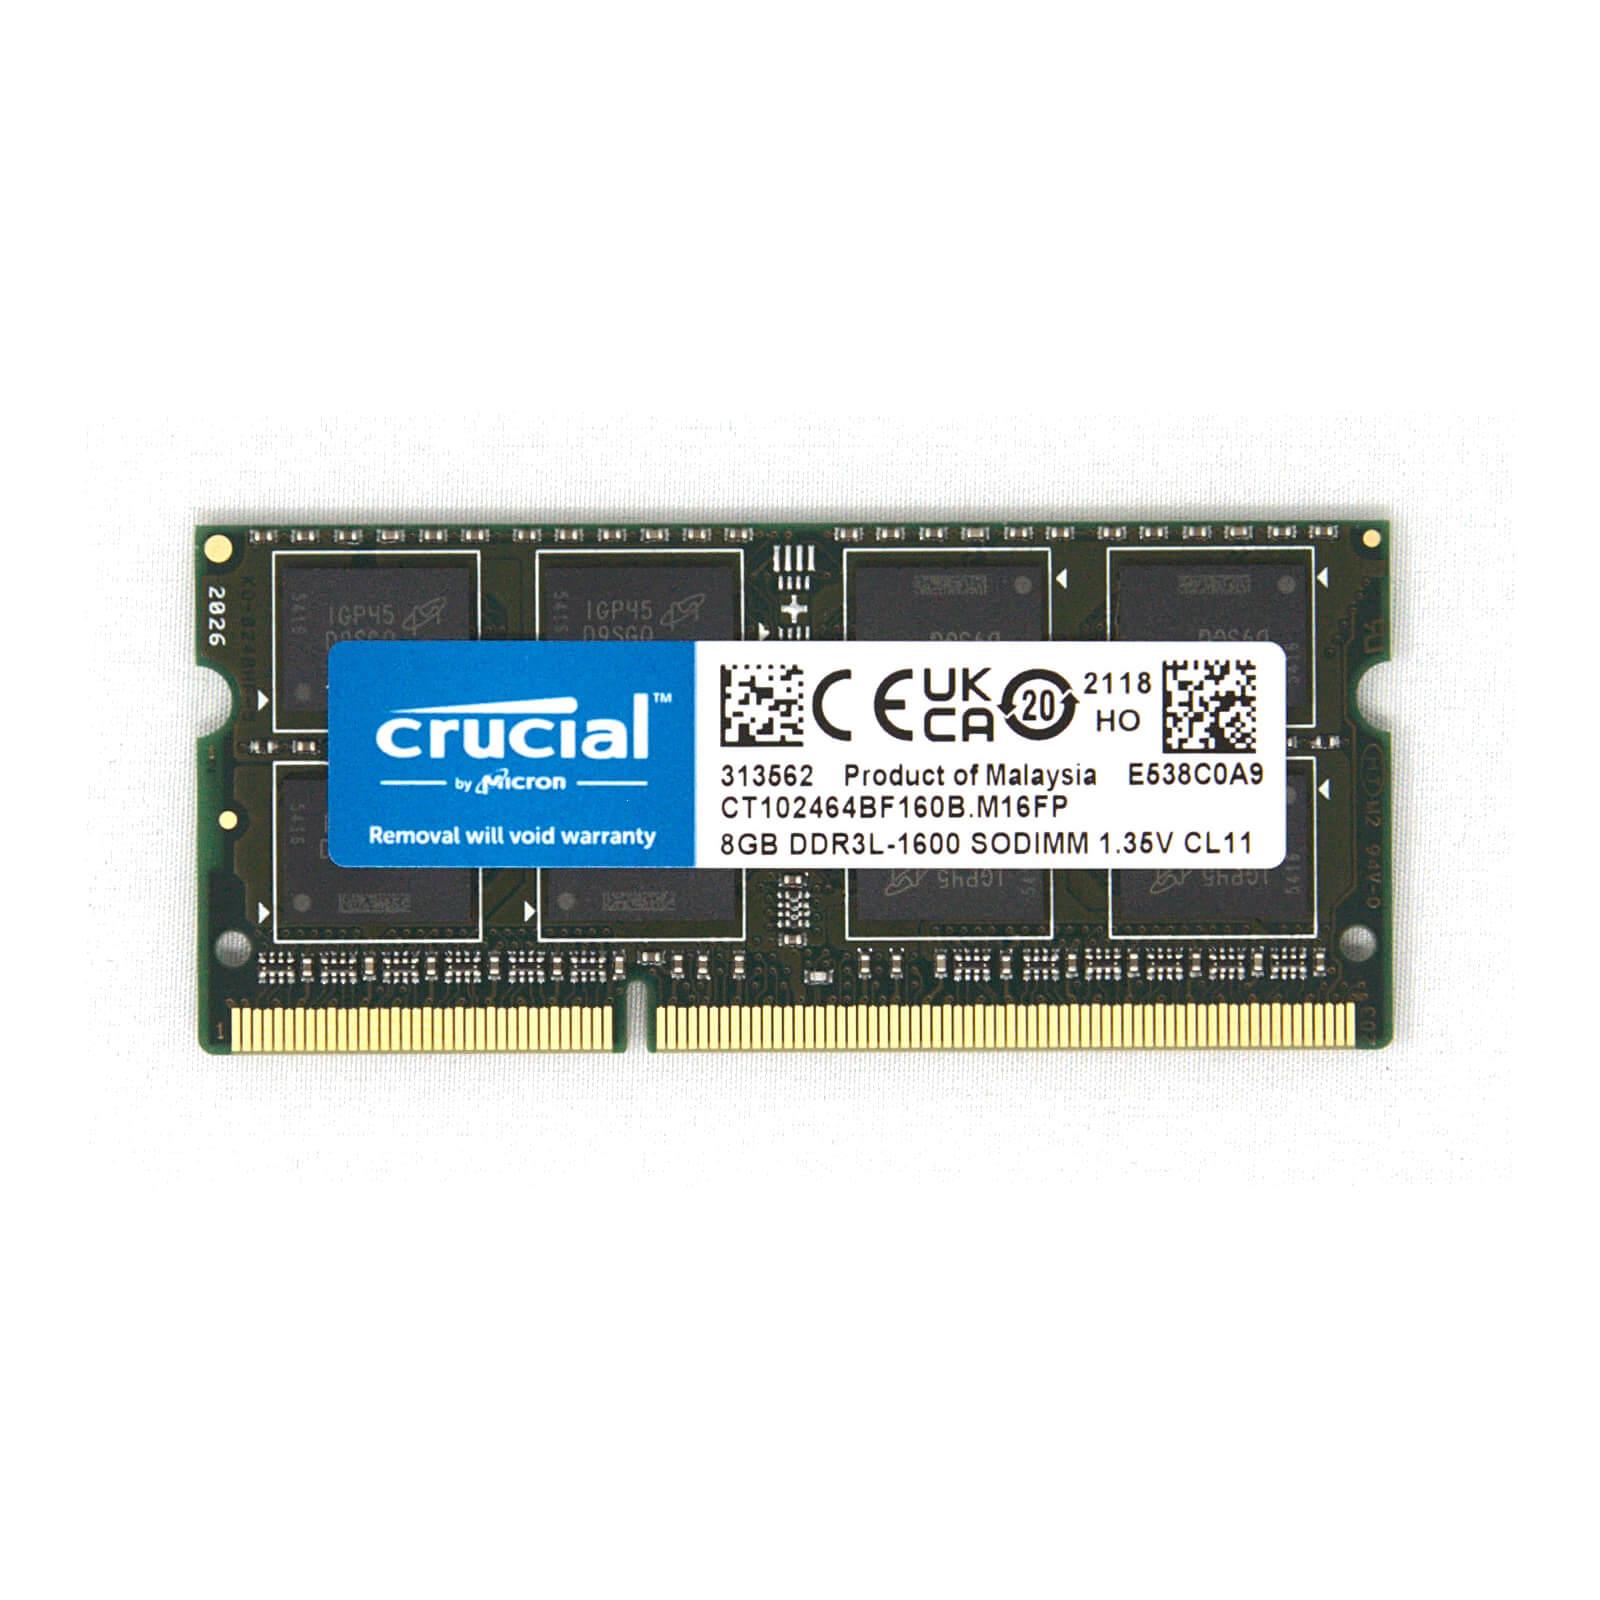 Crucial DDR3L SO-DIMM Memory Module – 8GB